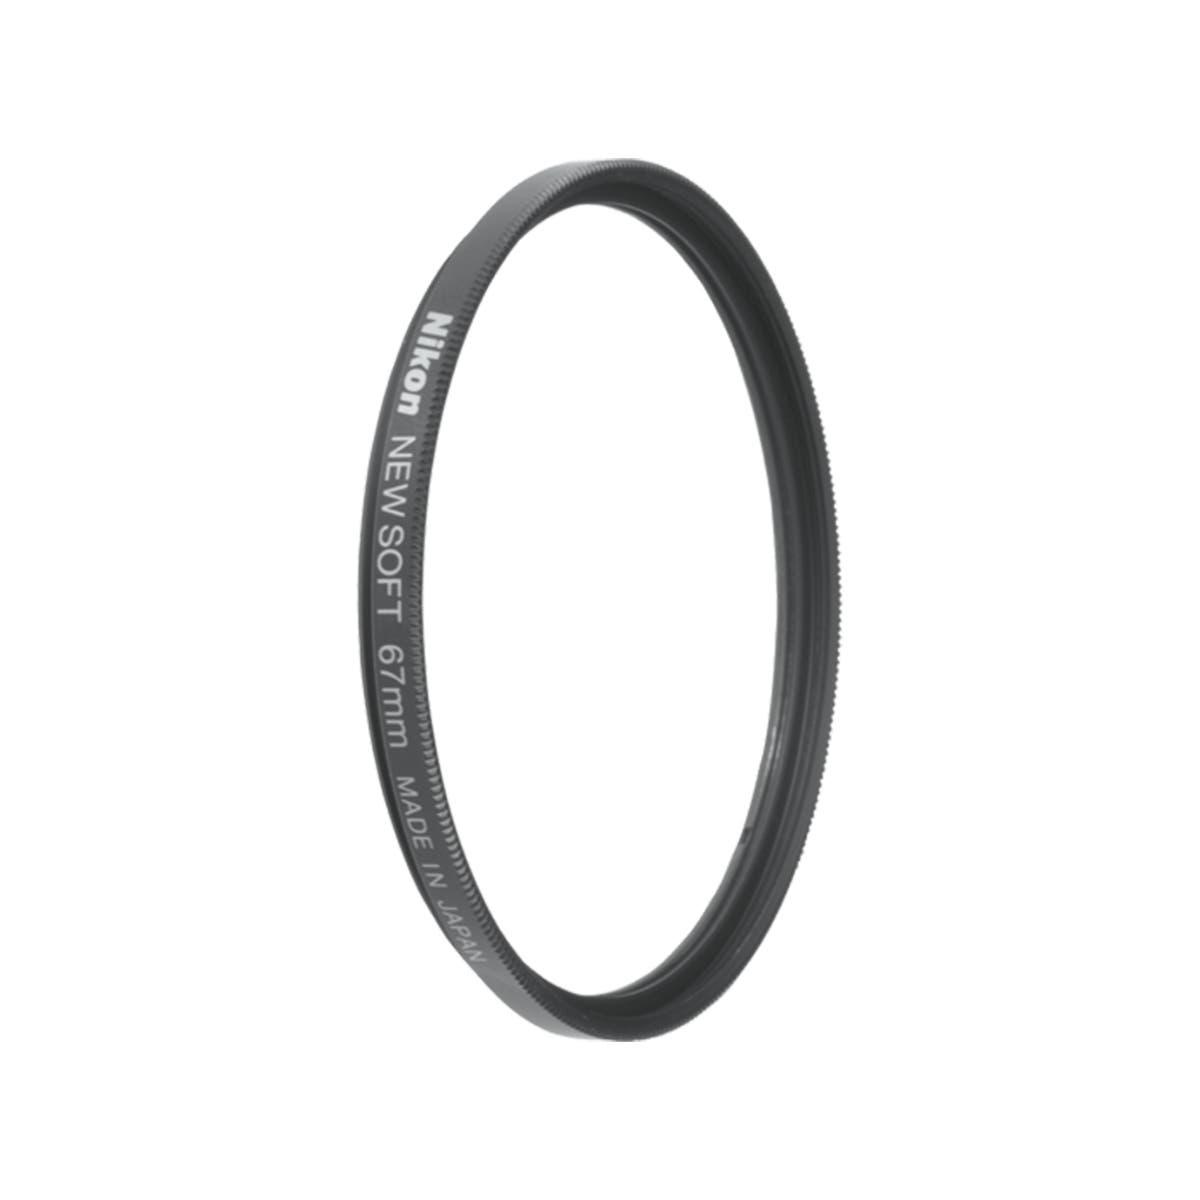 67mm Soft Focus Filter